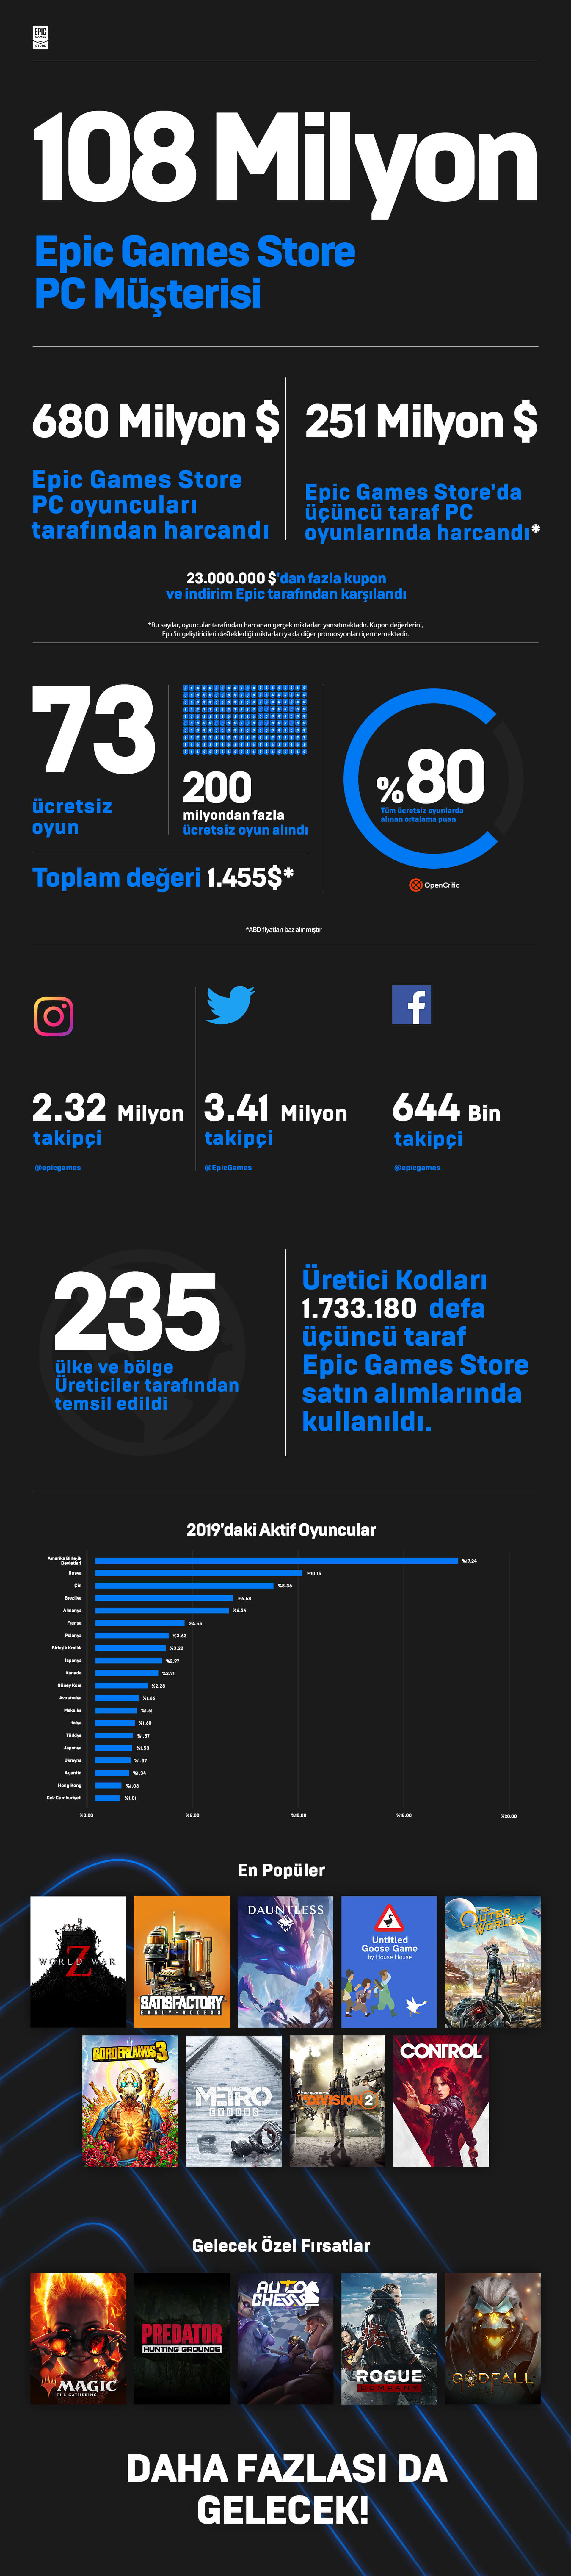 TR_EGS_Infographic.jpg